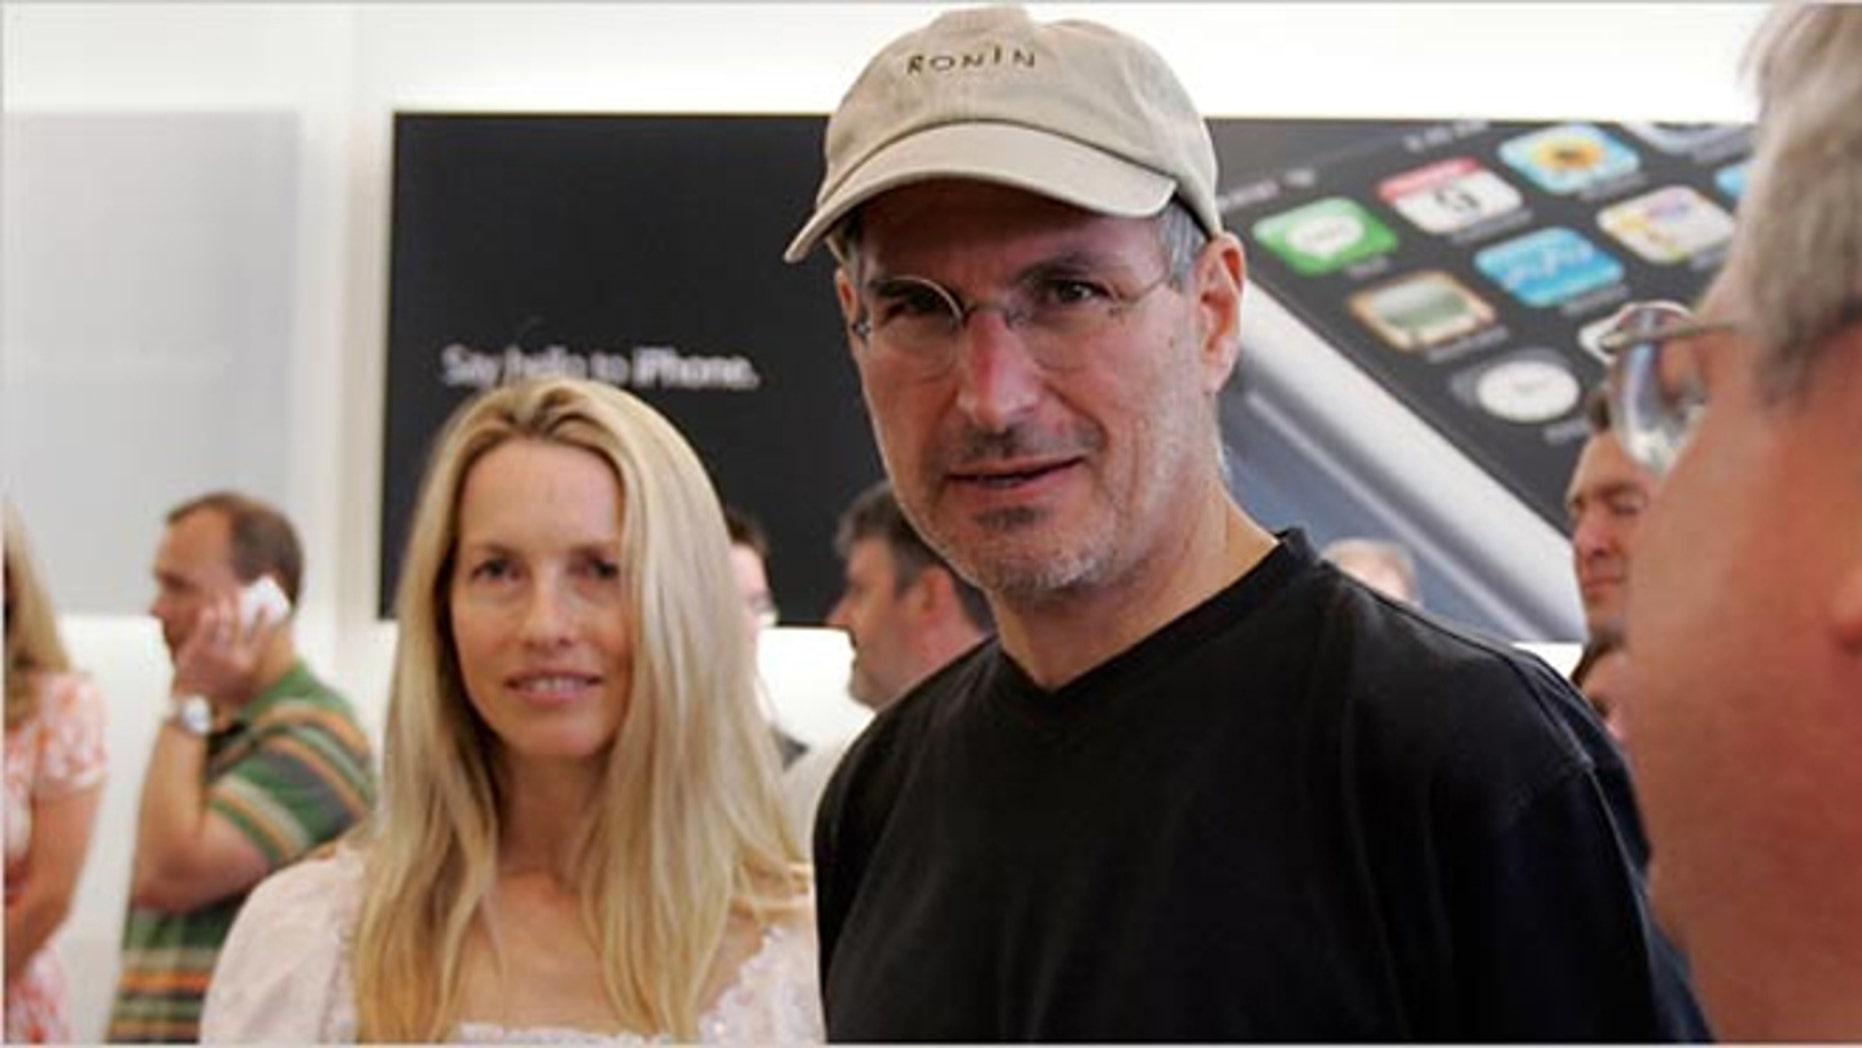 Steve Jobs with wife Laurene Powell Jobs, in 2007.